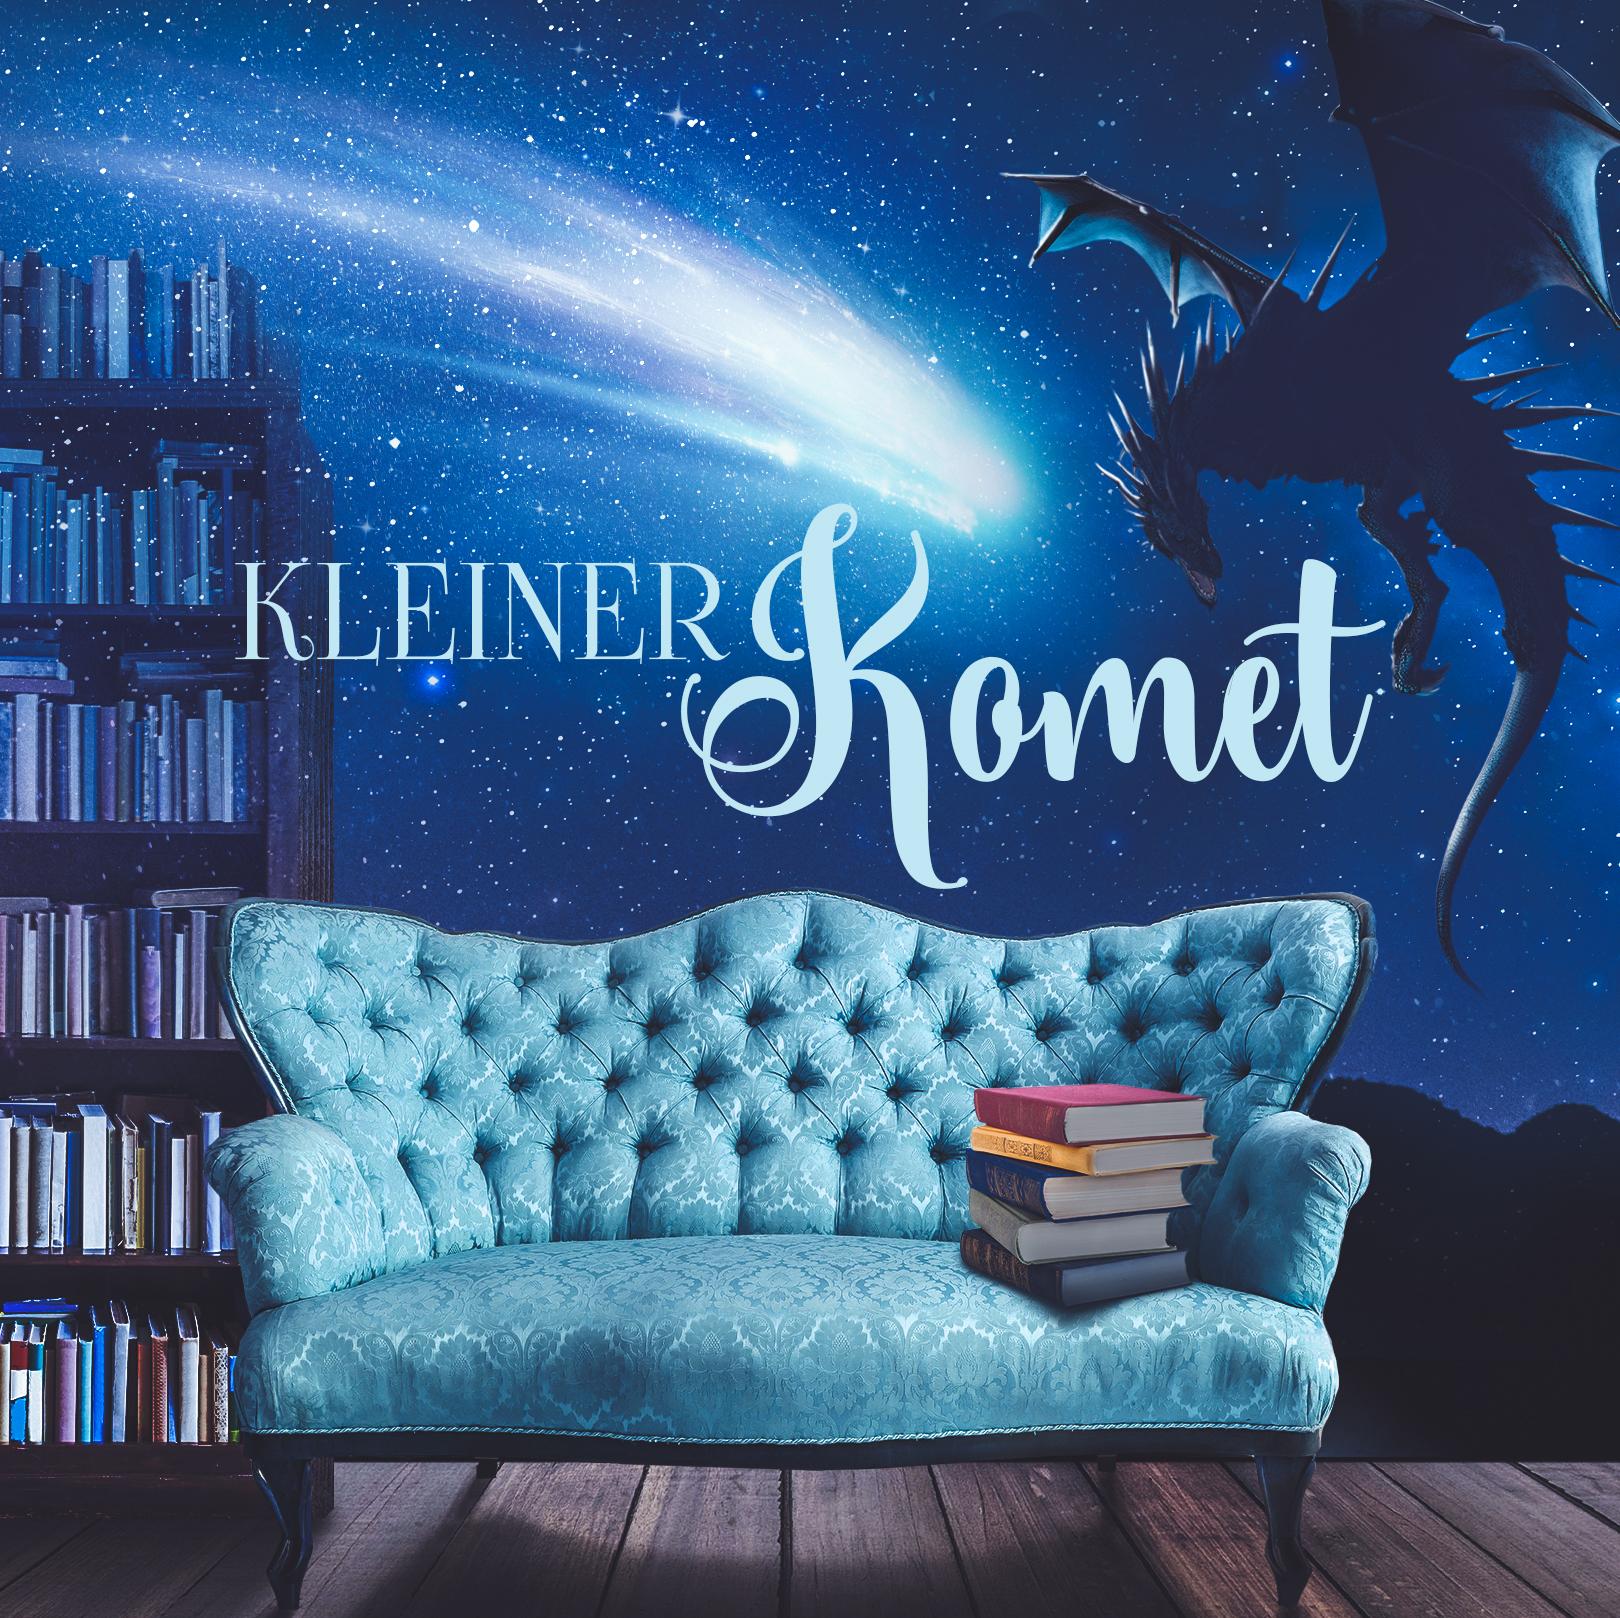 kleiner Komet (Stephanie)